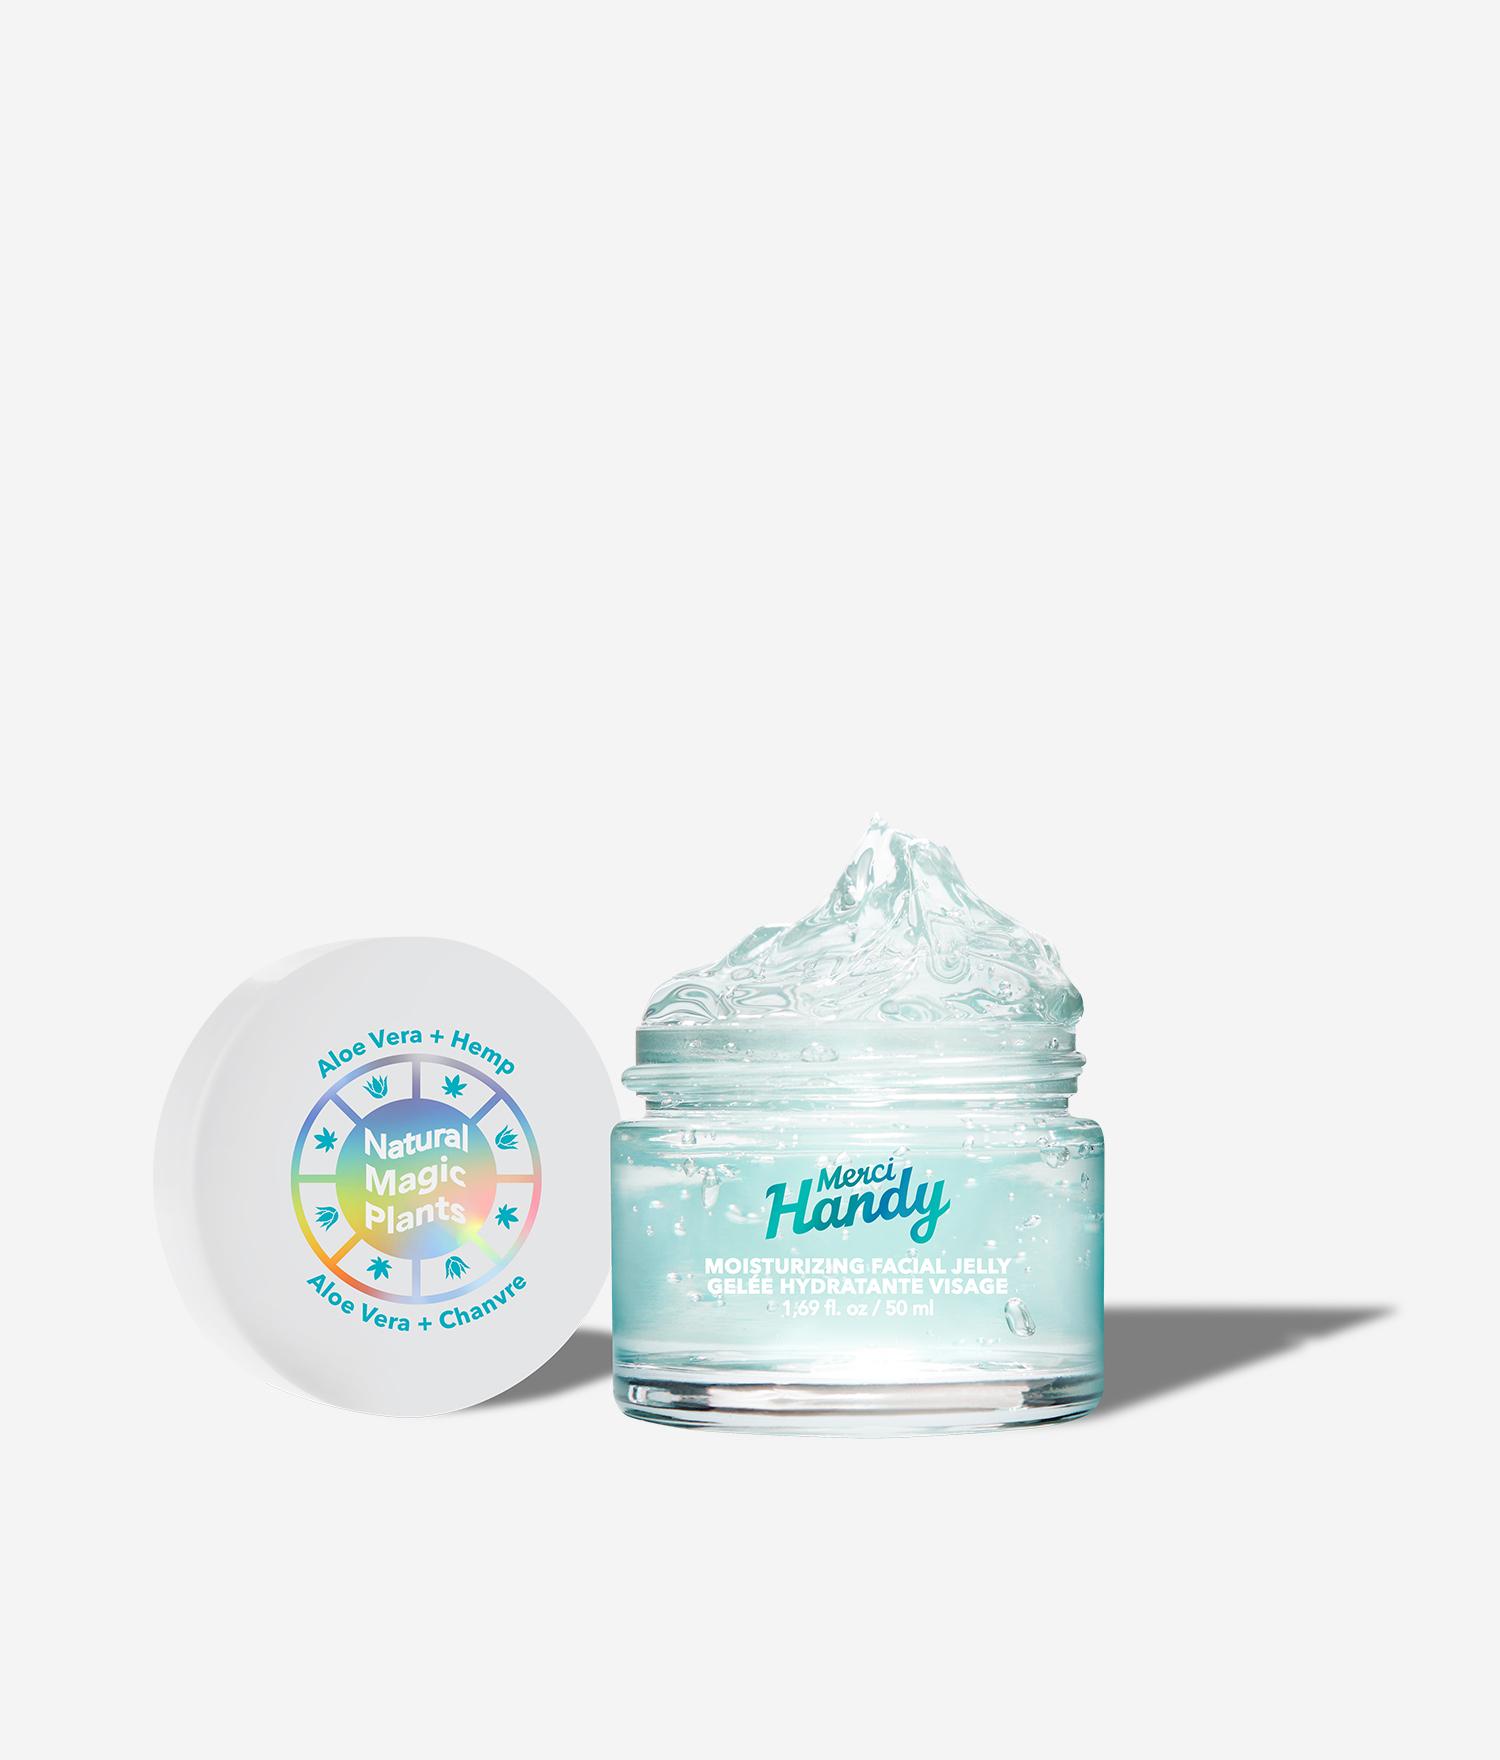 Moisturizing facial jelly